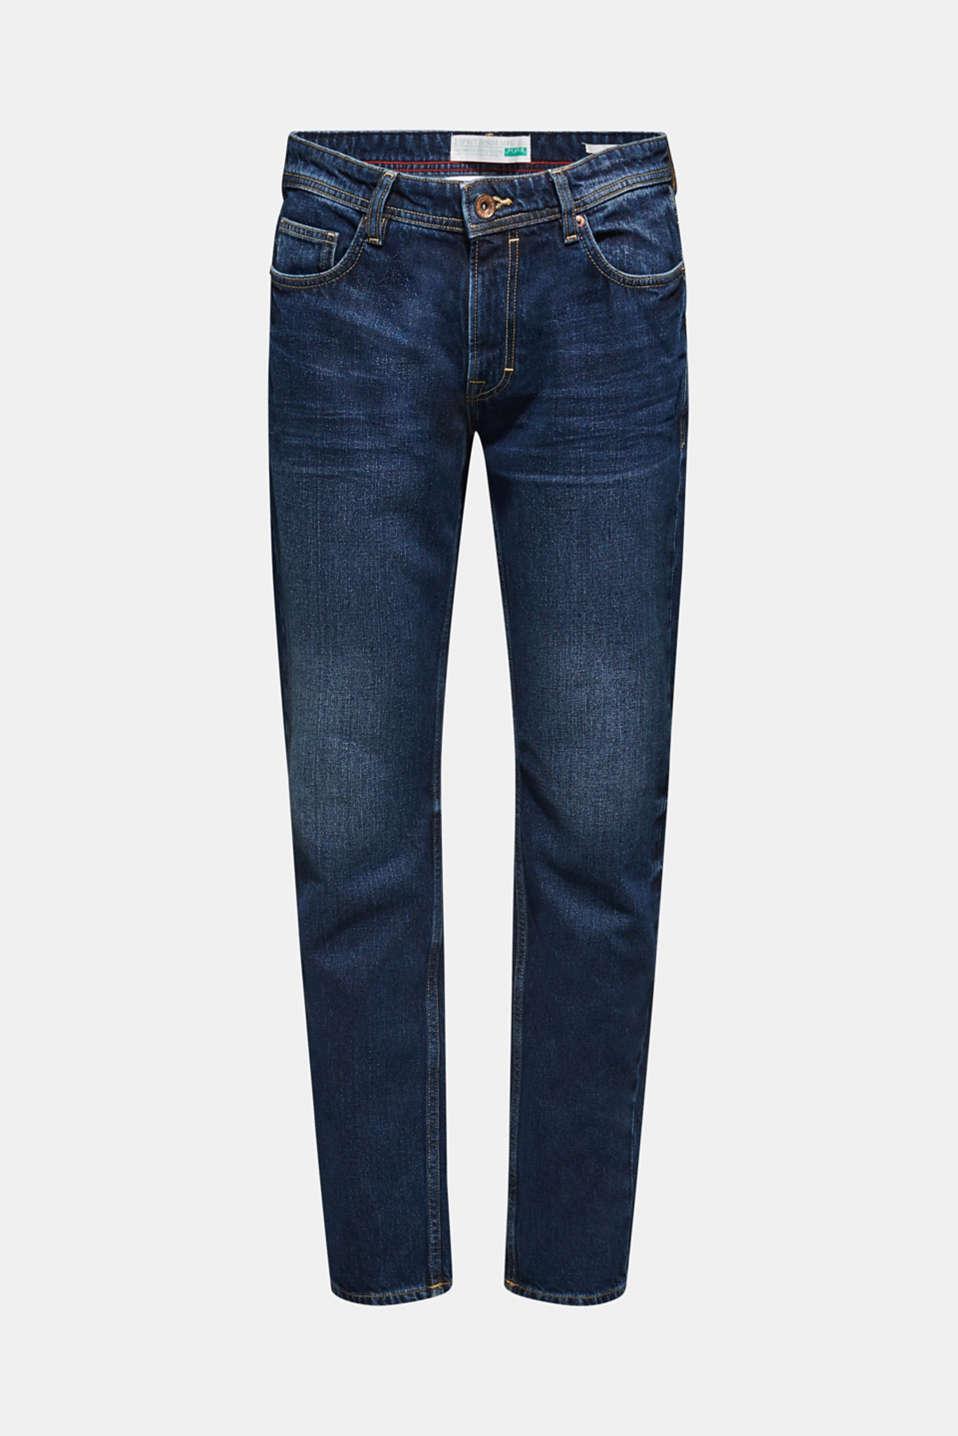 Stone wash jeans, 100% cotton, BLUE DARK WASH, detail image number 6